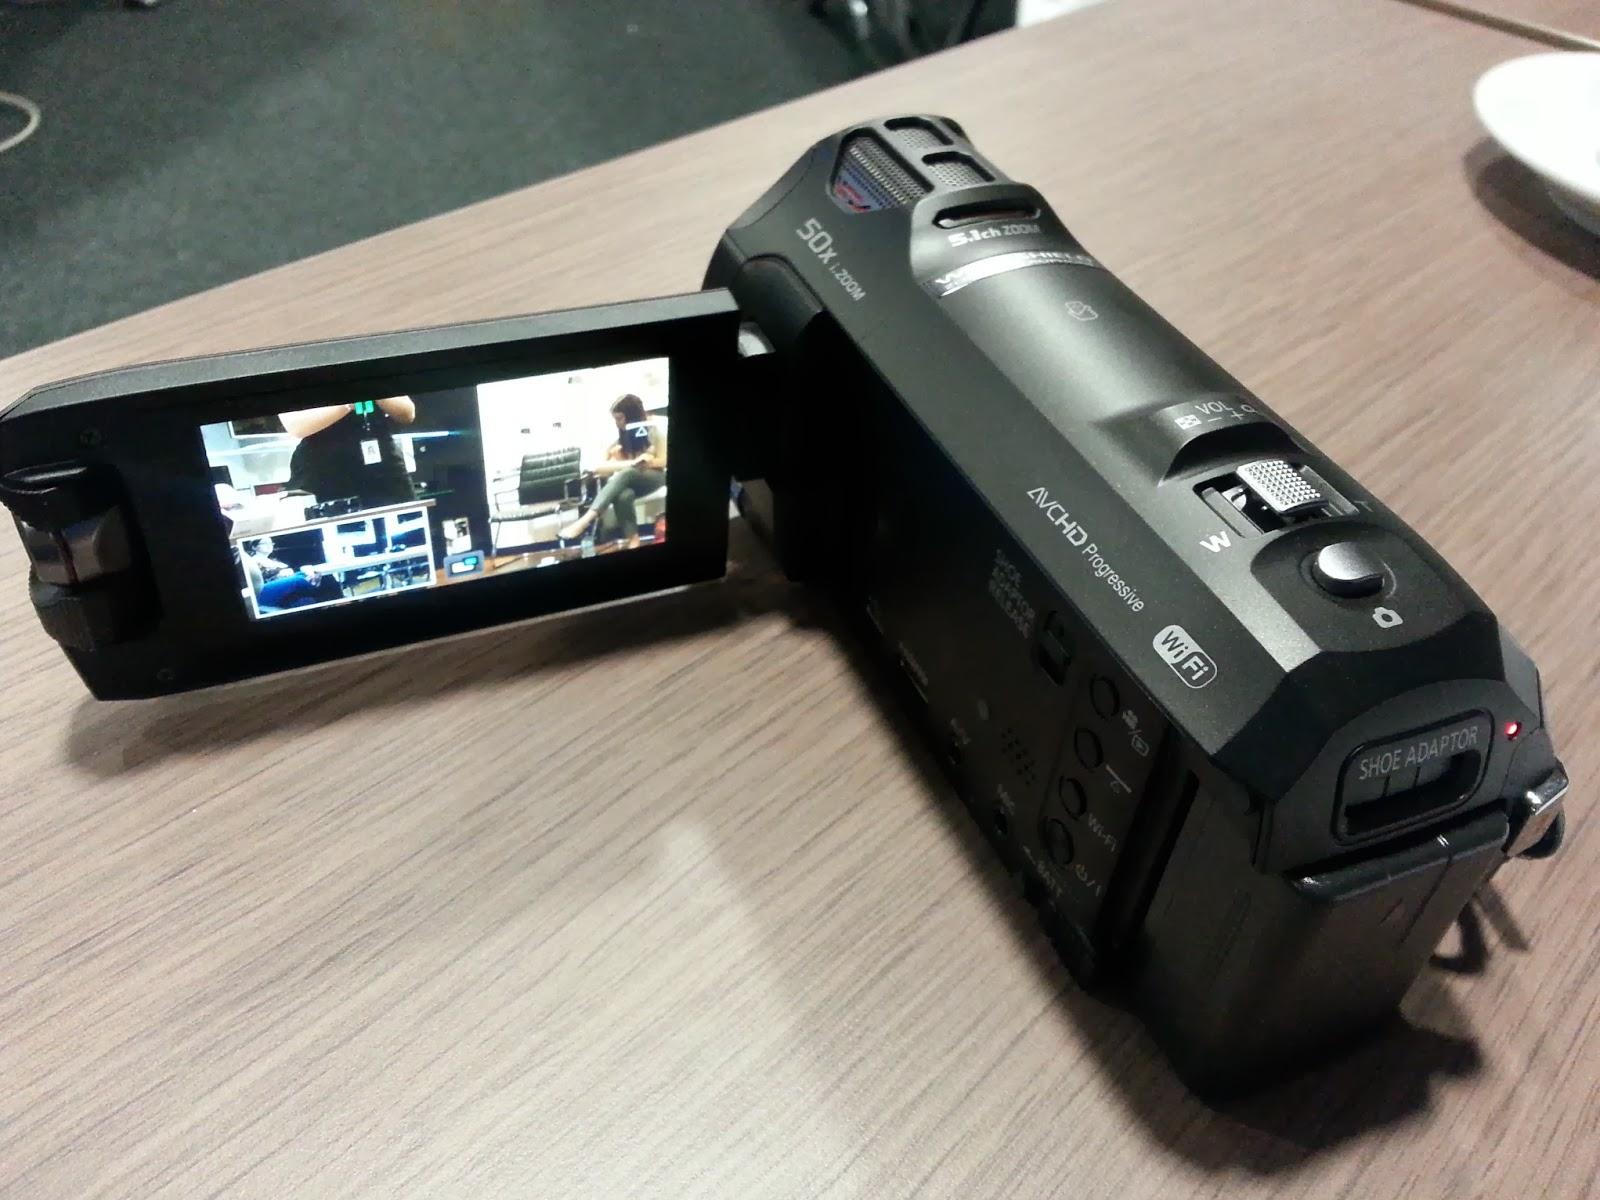 Panasonic Brit Blogger, Panasonic Cameras, Panasonic Camcorders